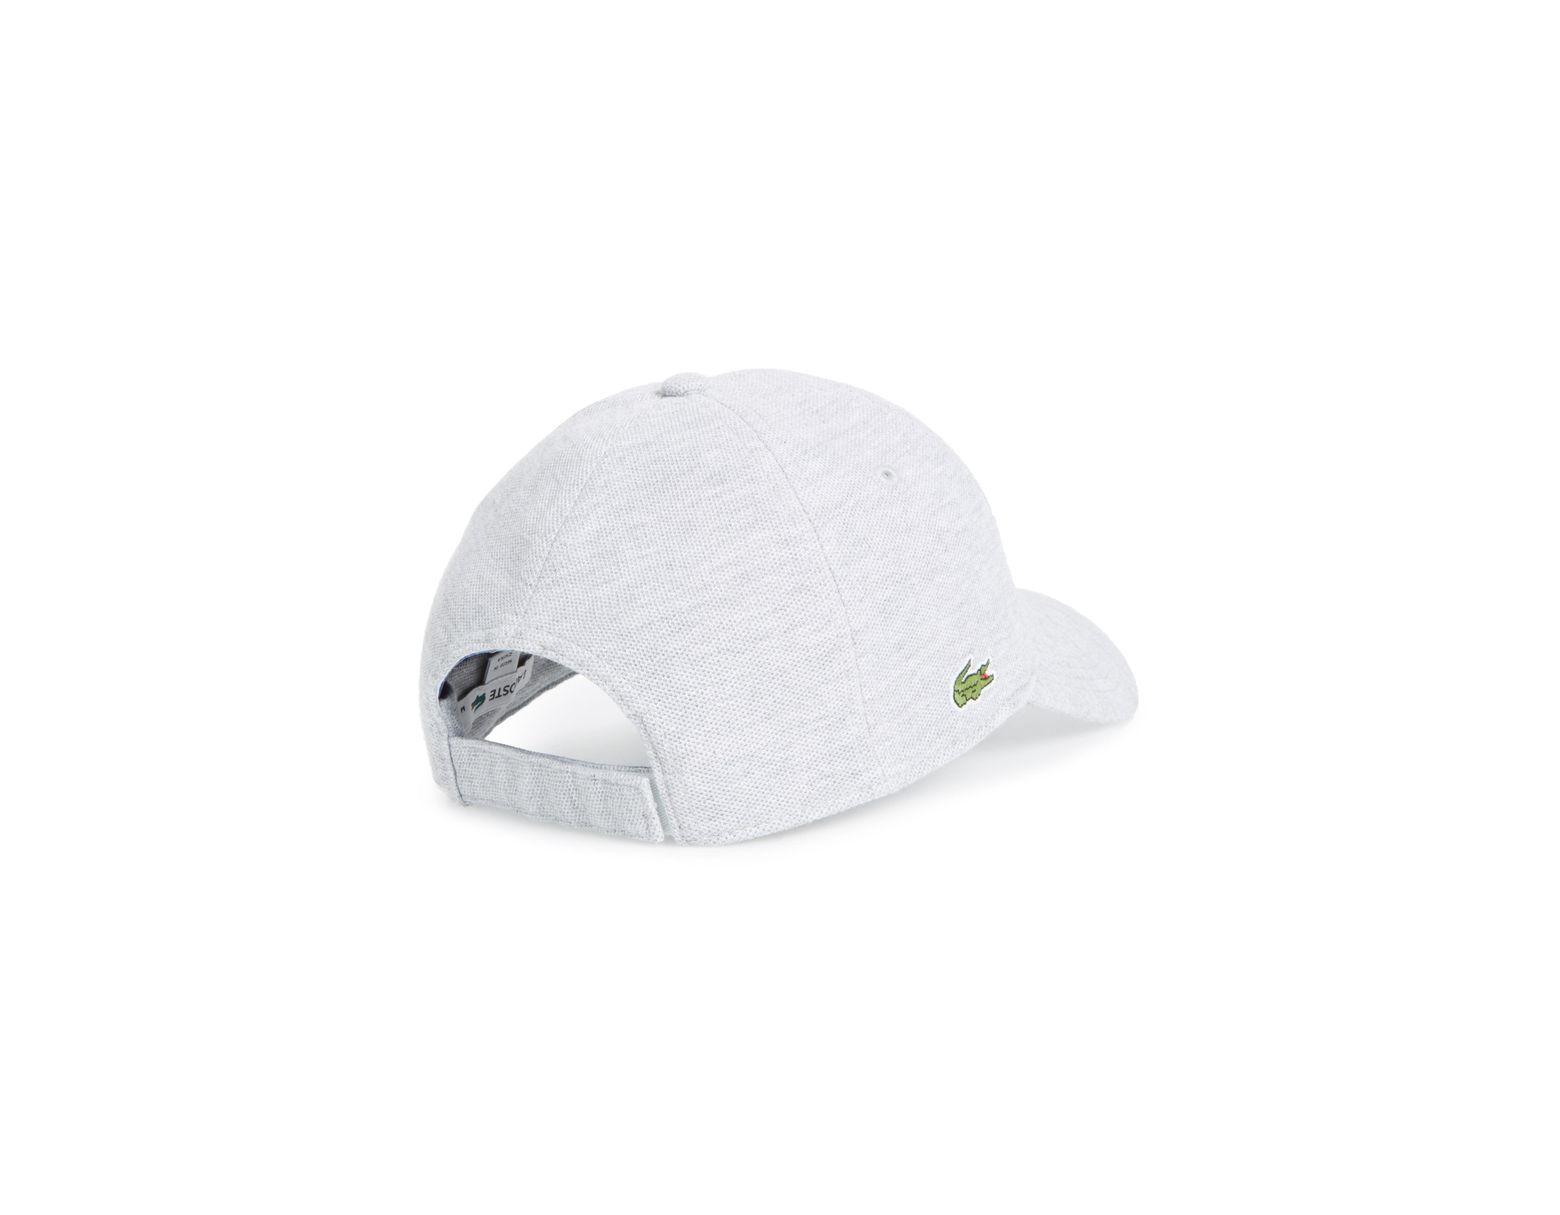 8cbbe7c30255c3 Lyst - Lacoste Croc Cotton Baseball Cap in White for Men